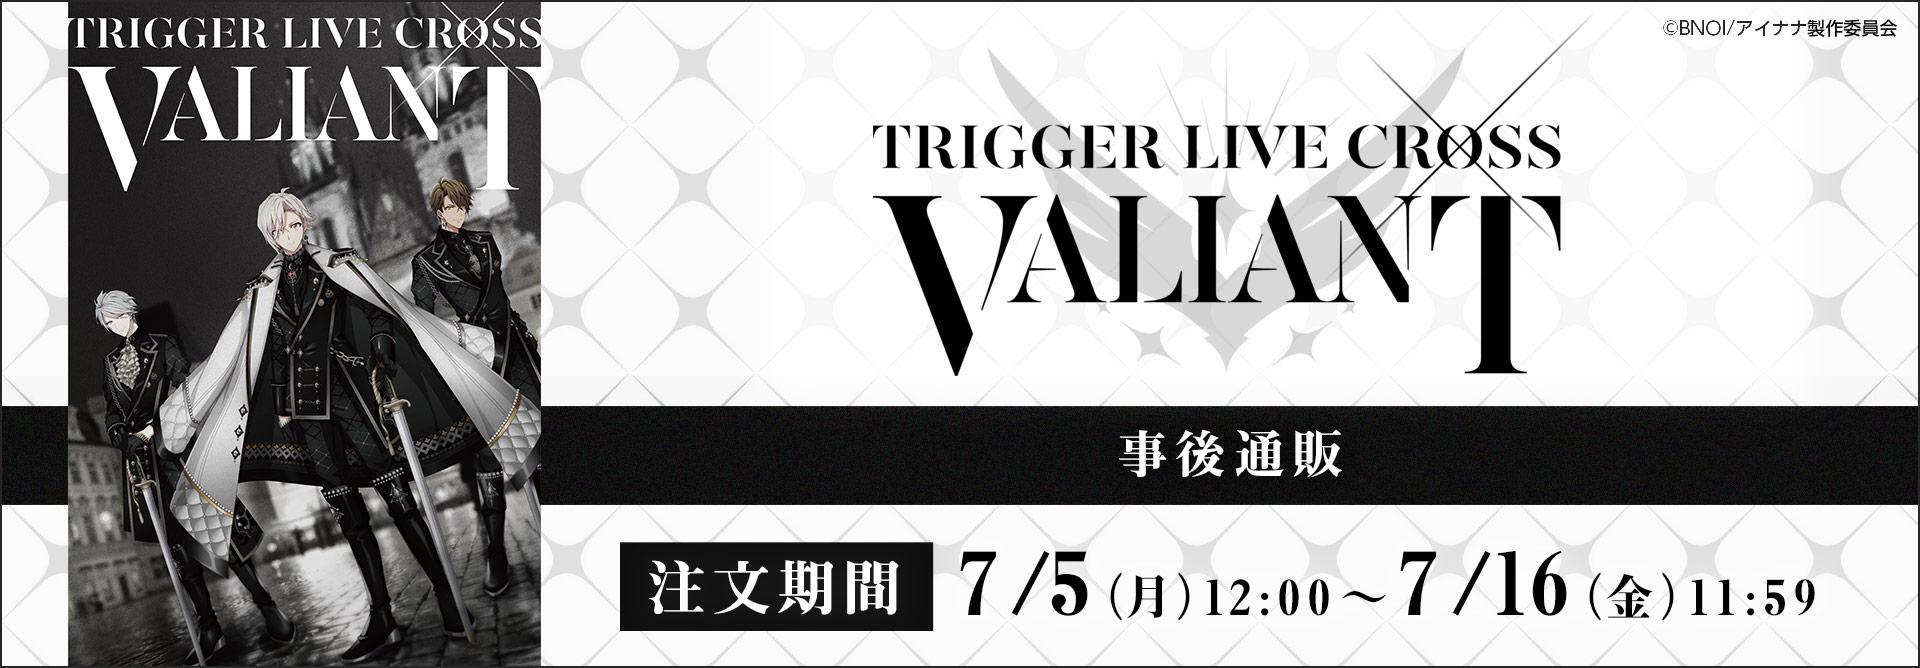 TRIGGER LIVE CROSS VALIANT 事後通販